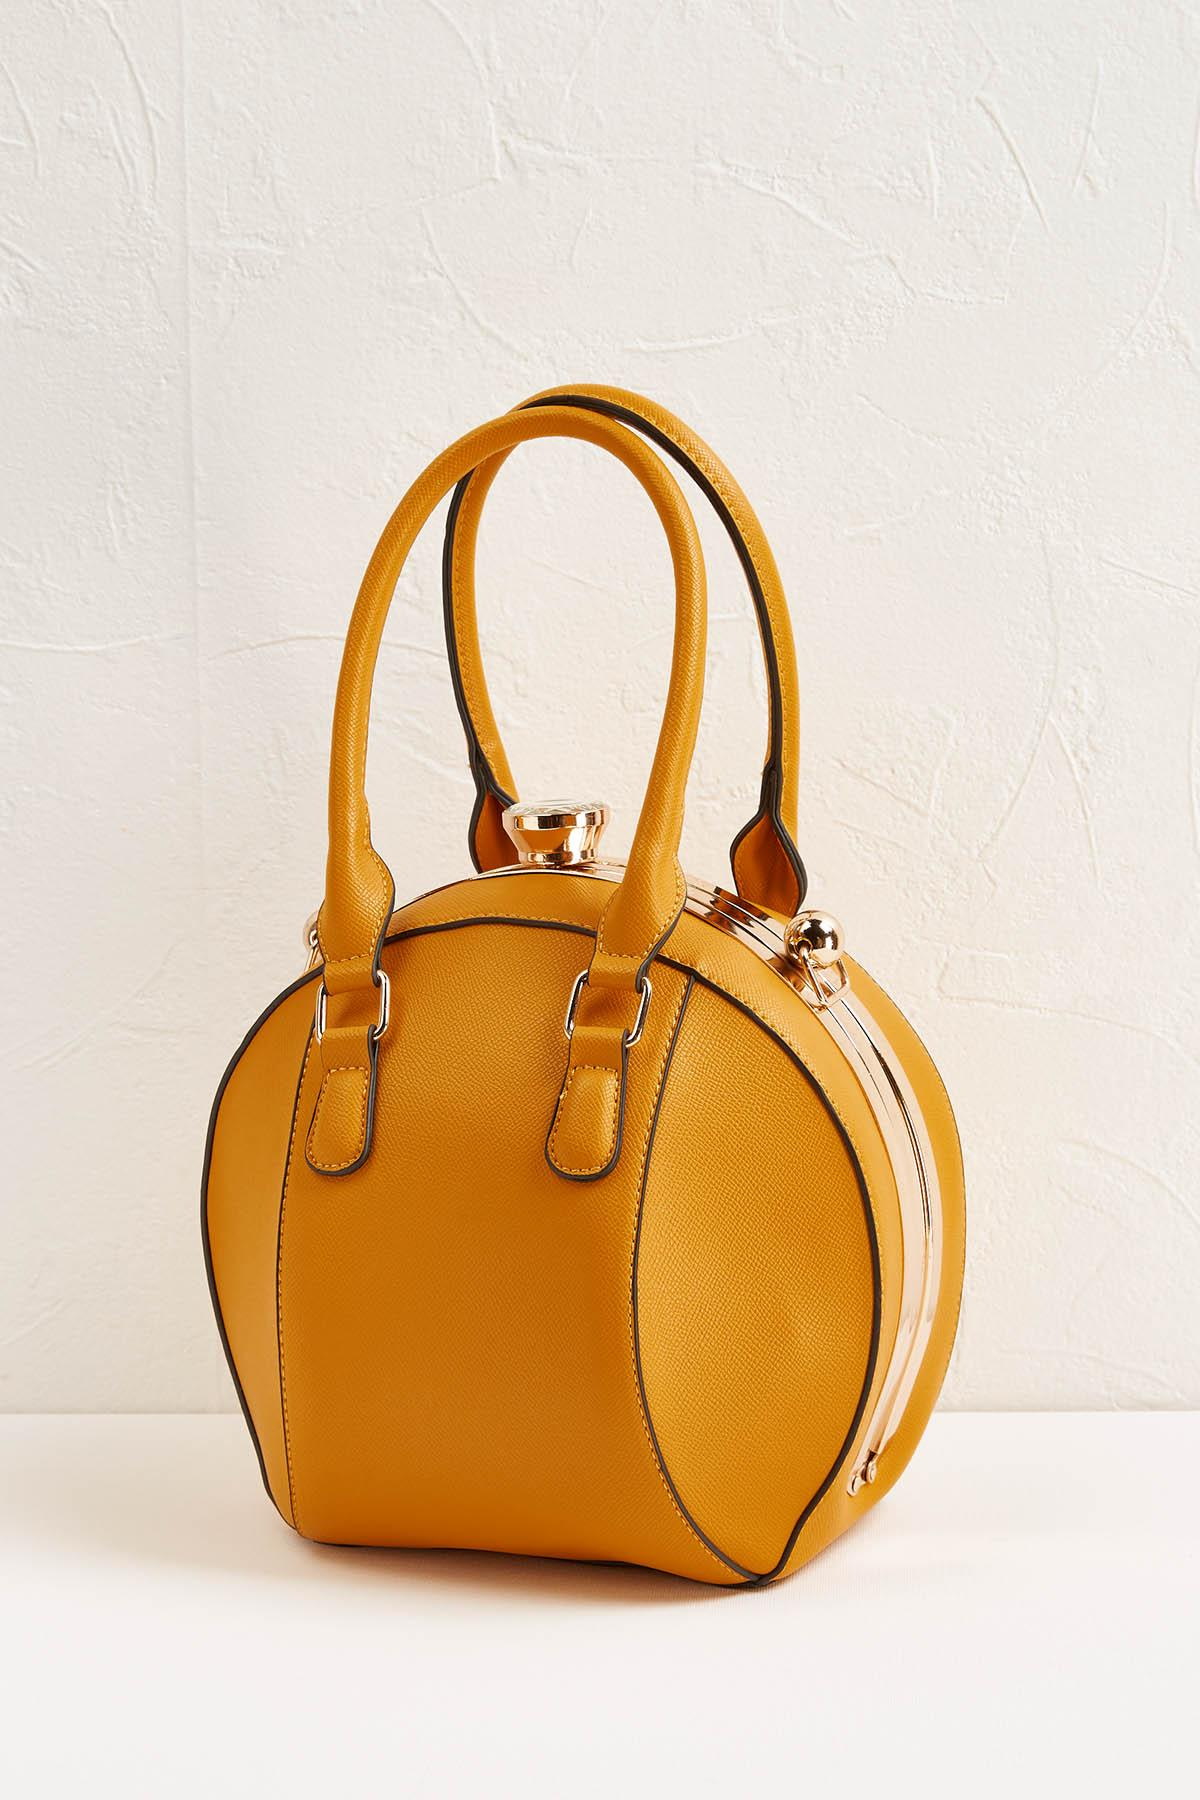 Ball Shaped Yellow Handbag